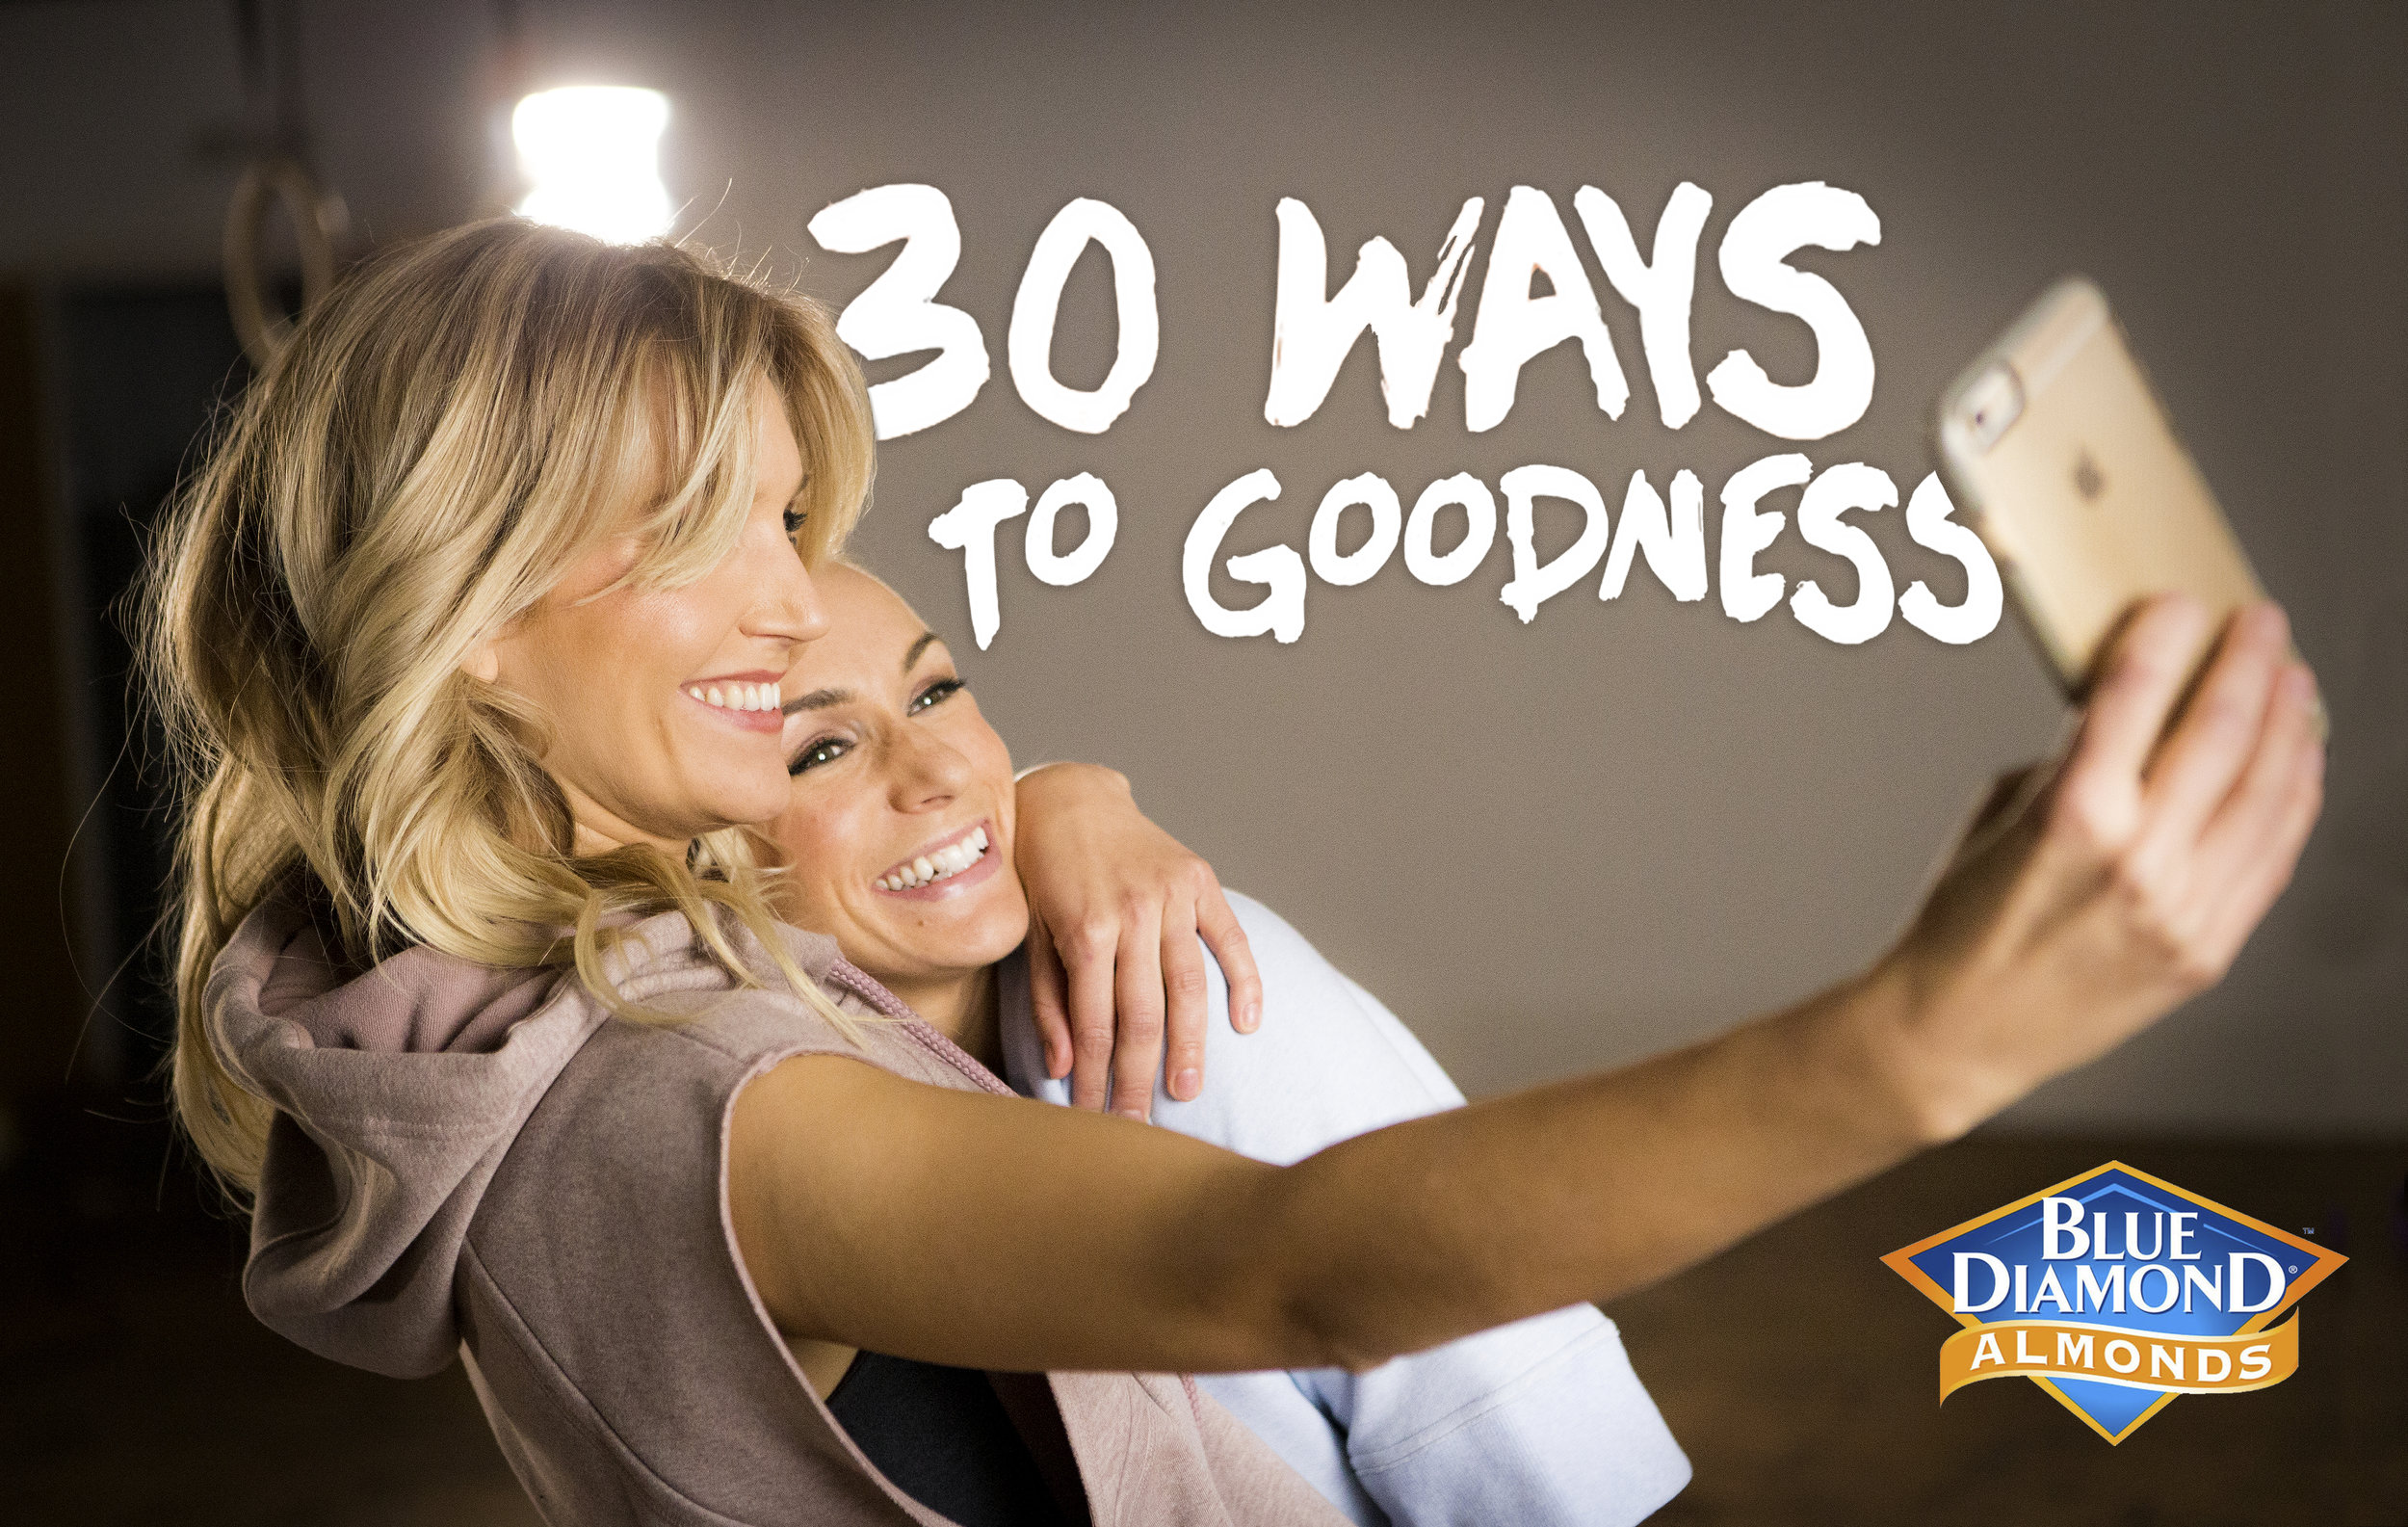 Blue Diamond's 30 Ways To Goodness